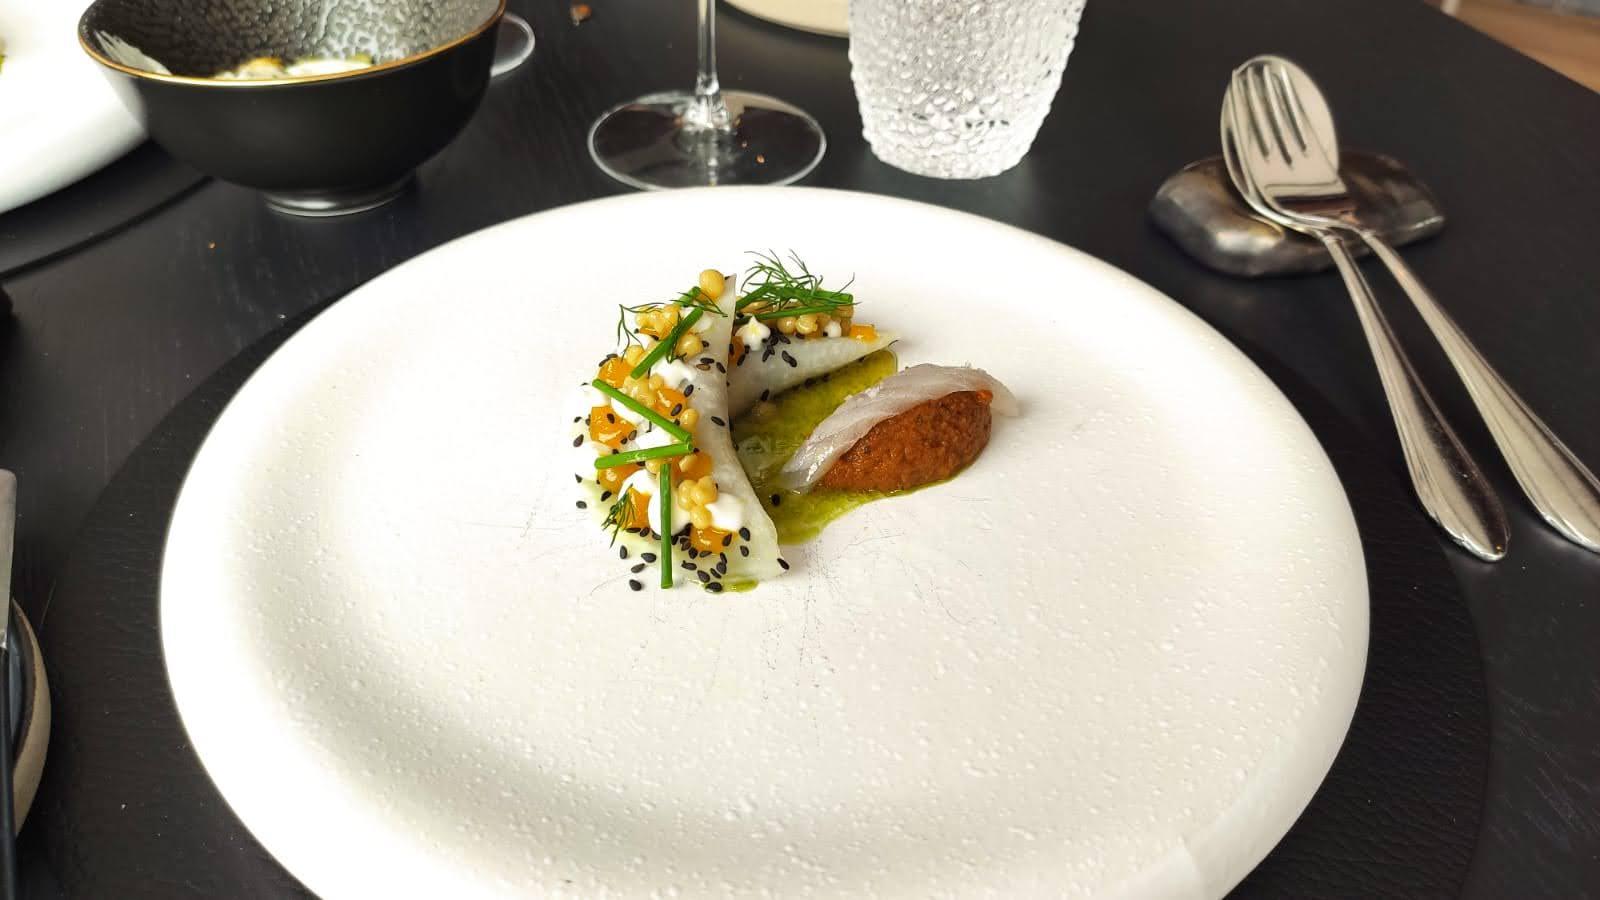 Ravioli van koolrabi met ceviche van zeebaars, crème van citroen, garum (Latijnse vissaus), kaviaar van olijf en tartaar van aubergine